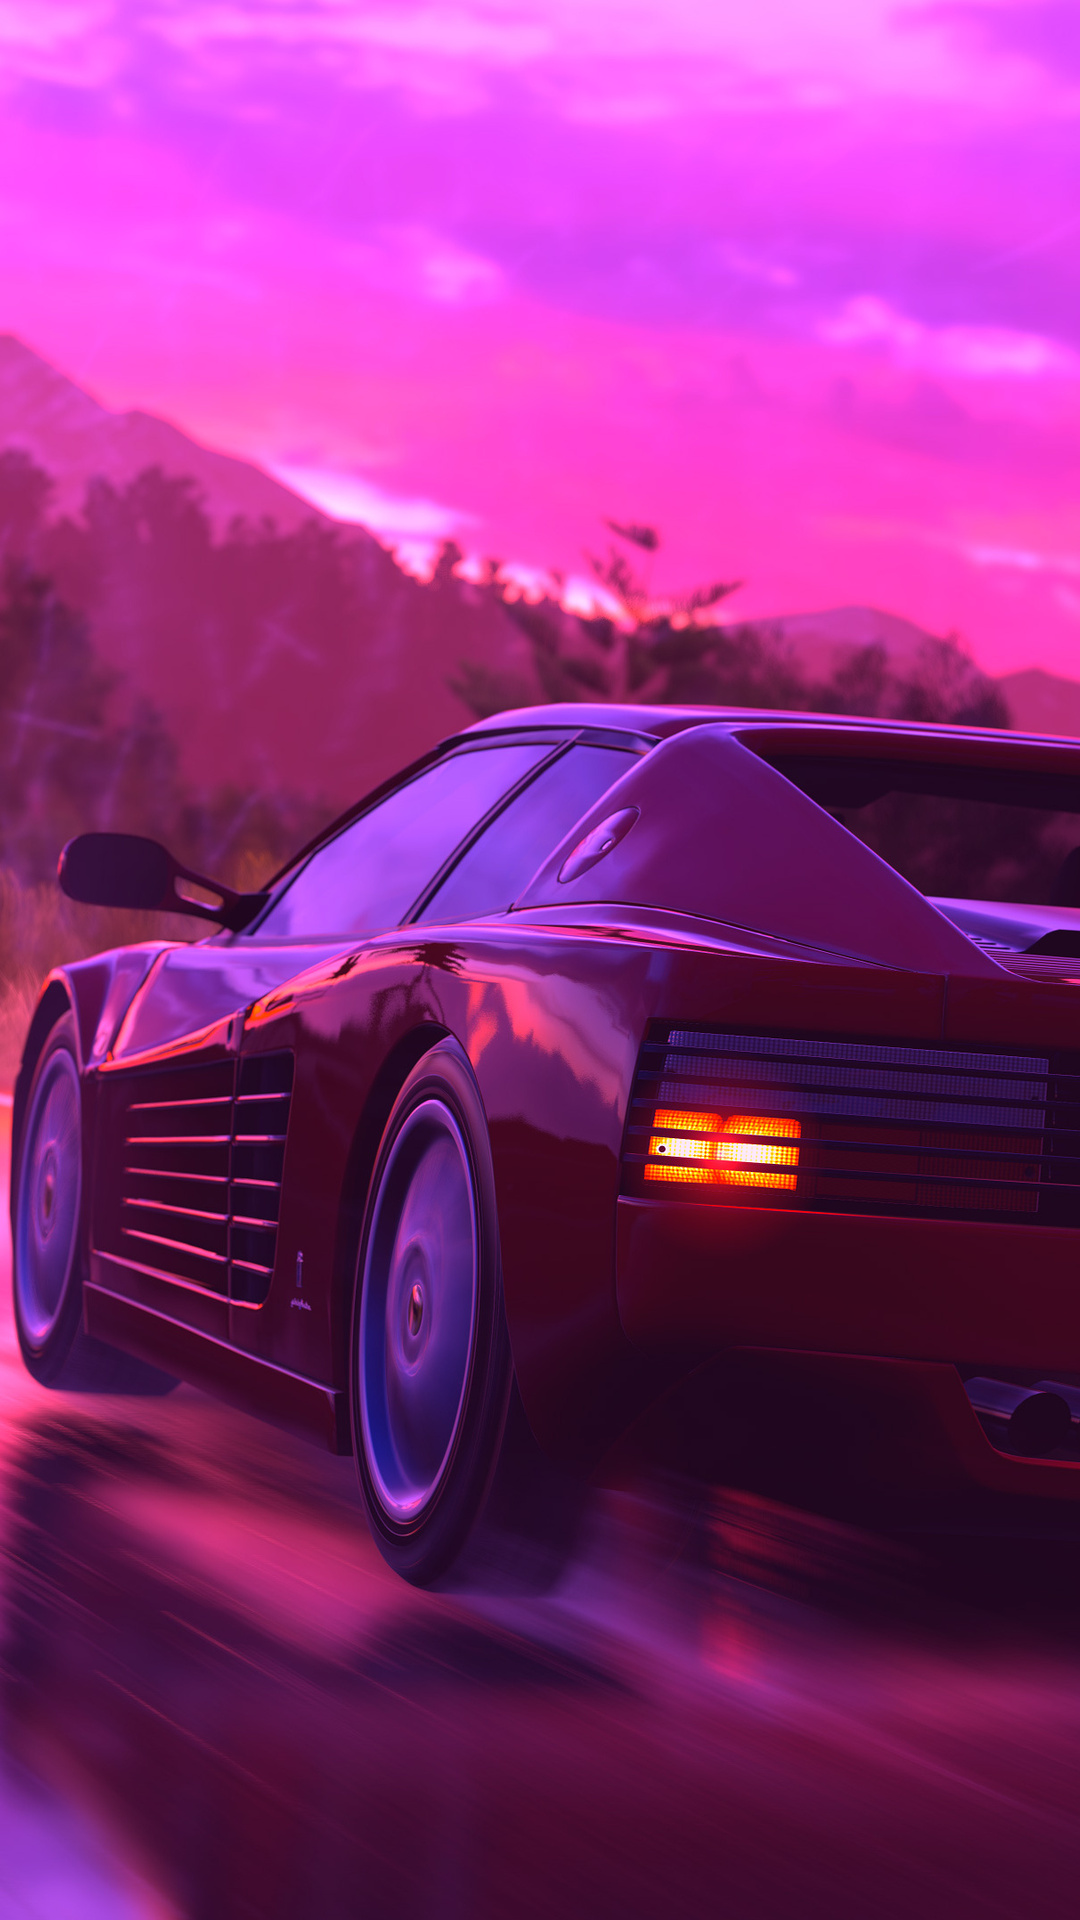 1080x1920 Ferrari Sports Car Retrowave Art 4k Iphone 7,6s ...